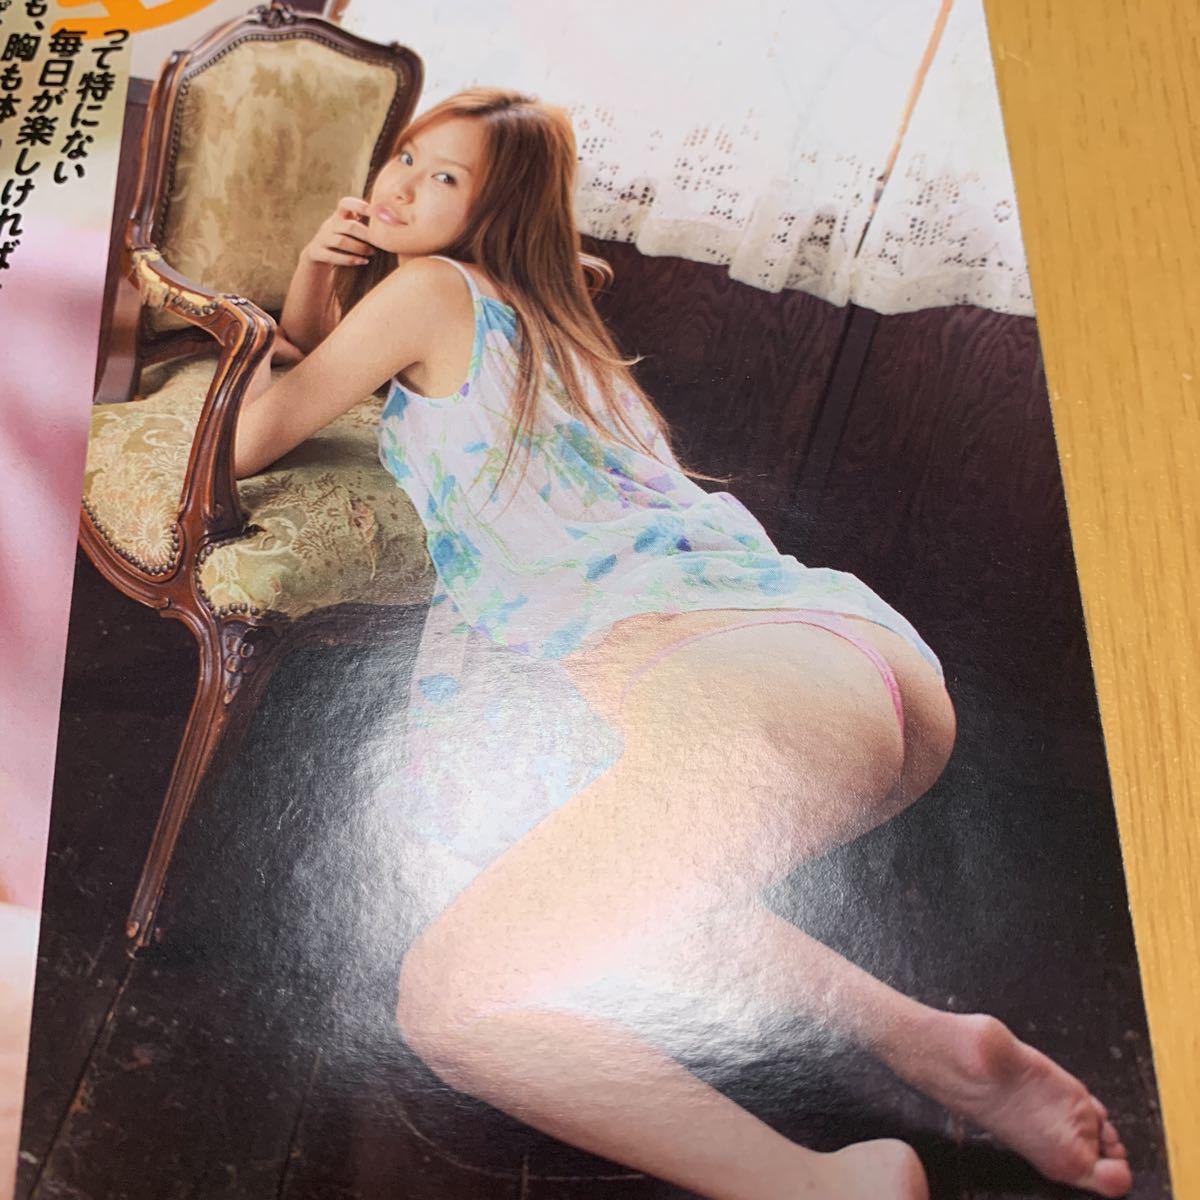 A43-2 丘咲エミリ 切り抜き3ページ2012年☆送料140_画像1